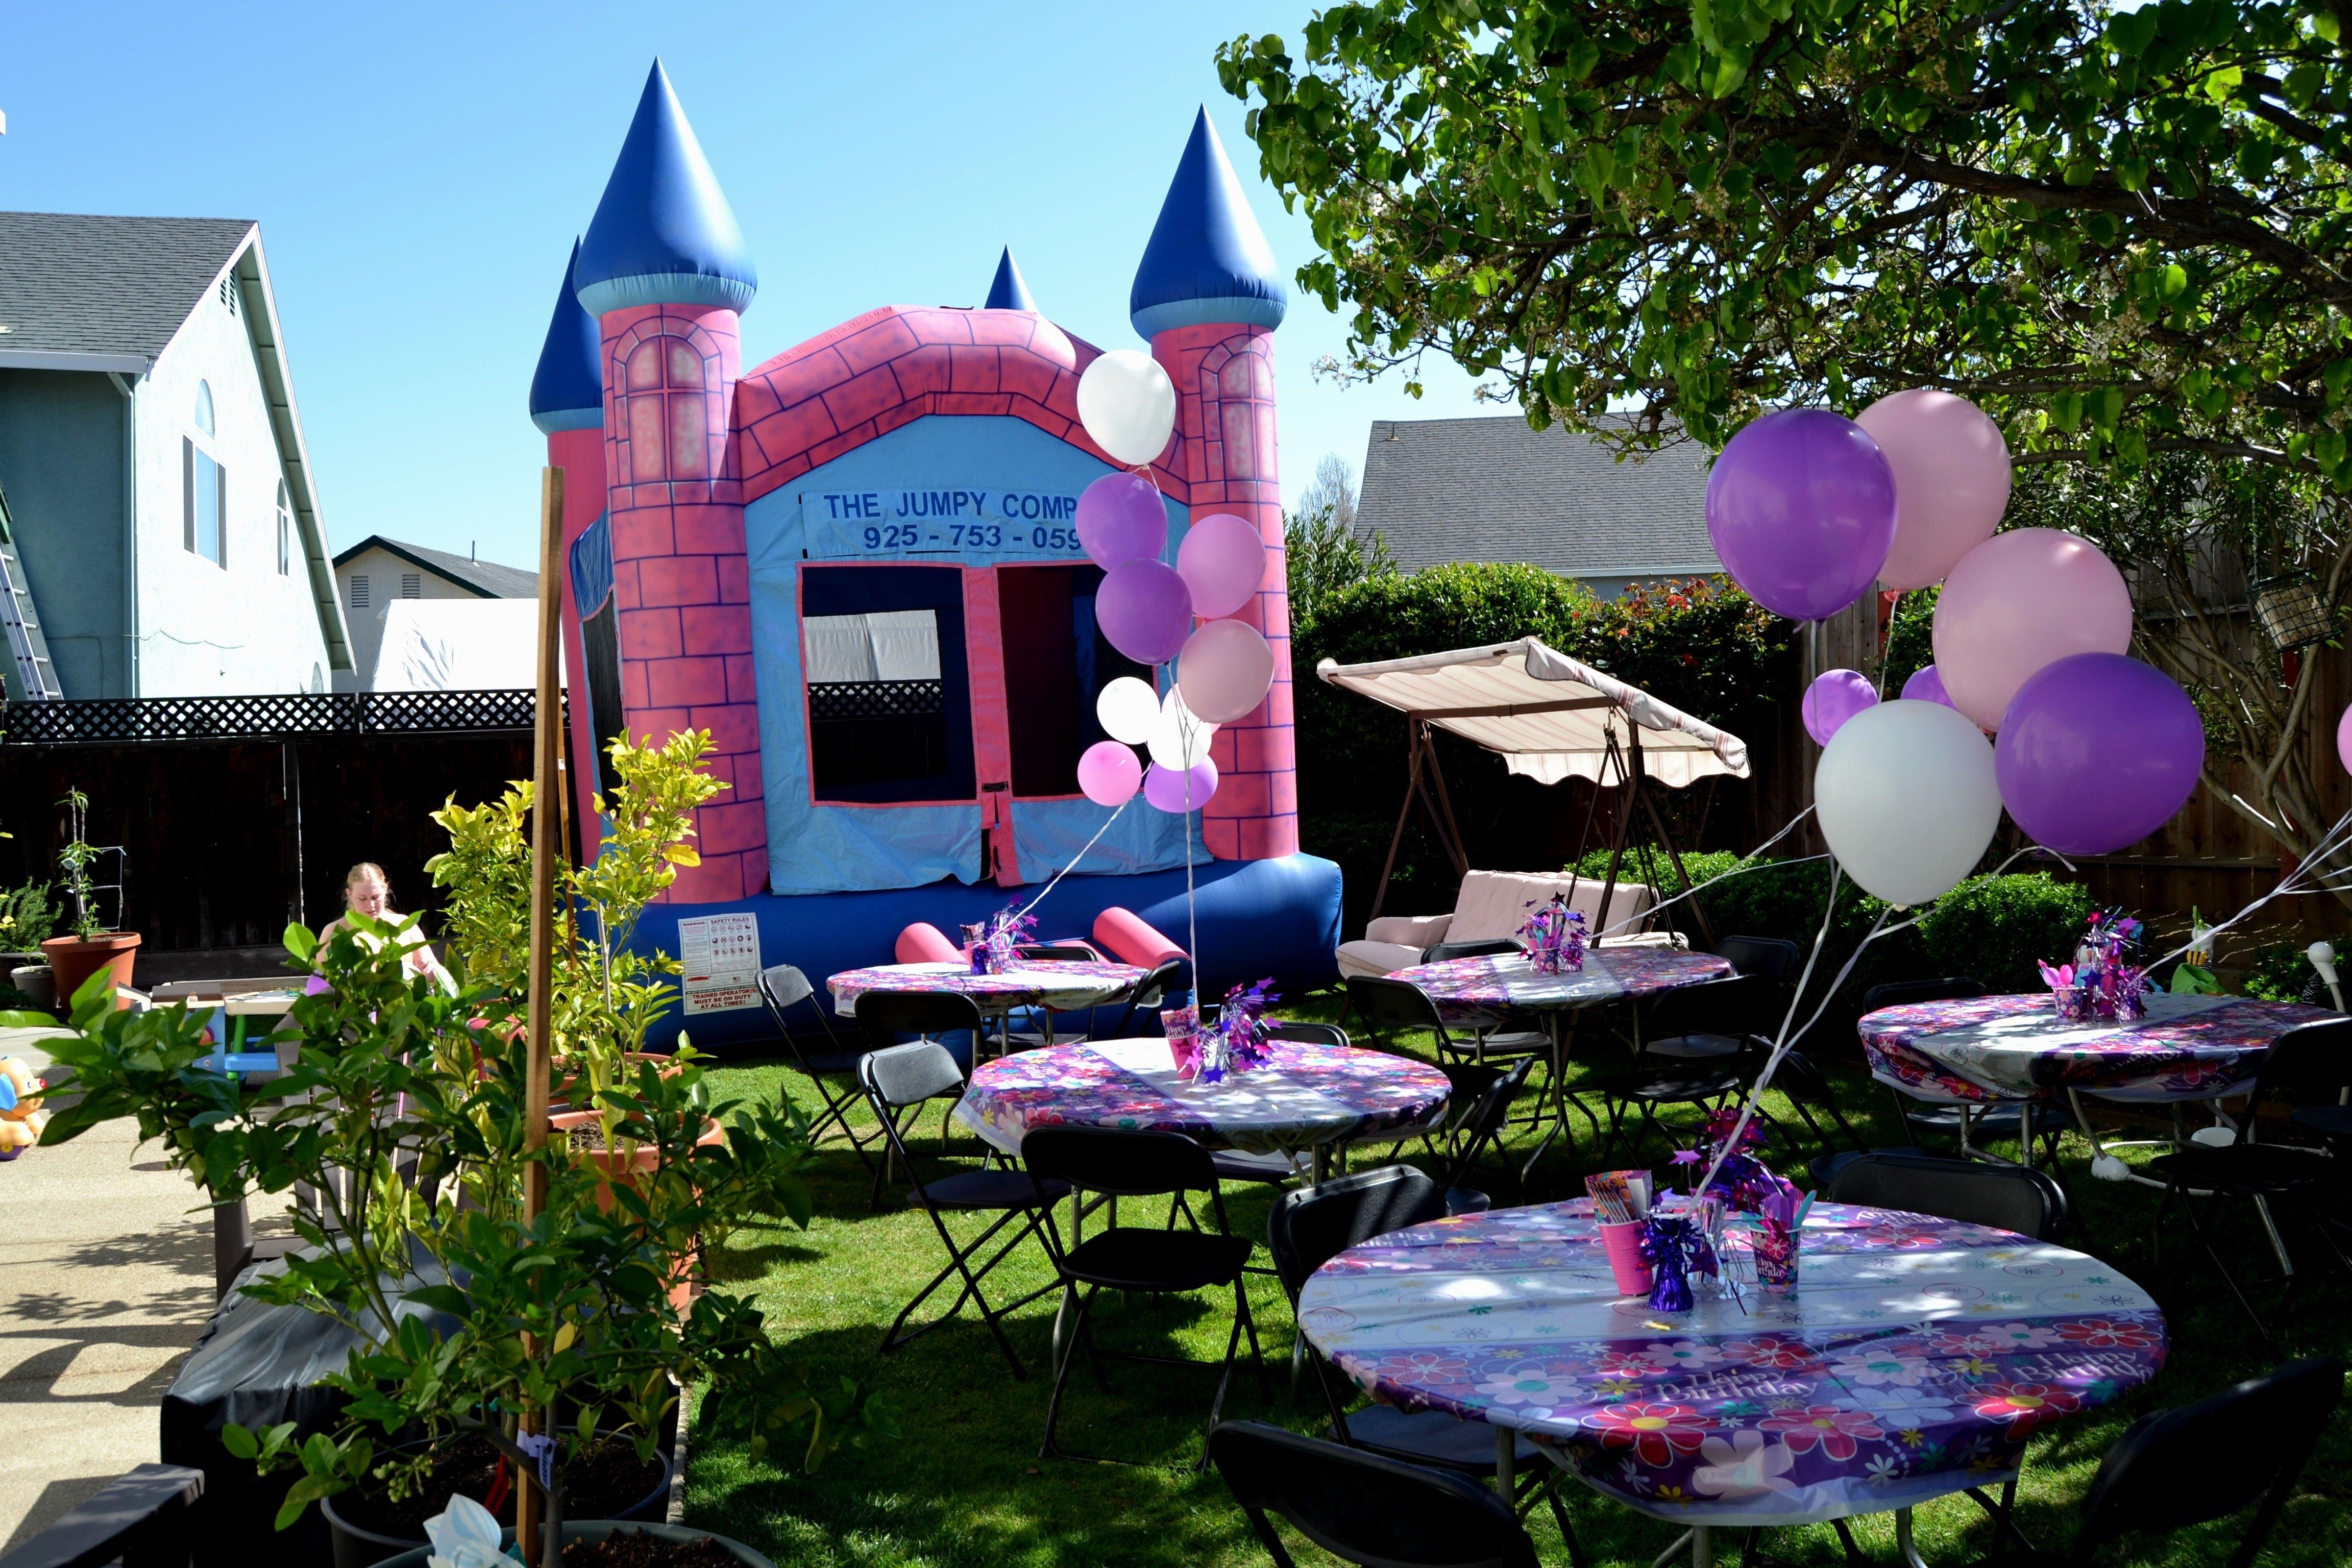 10 Wonderful Sweet 16 Pool Party Ideas ideas collection sweet sixteen backyard party ideas with backyard 2020